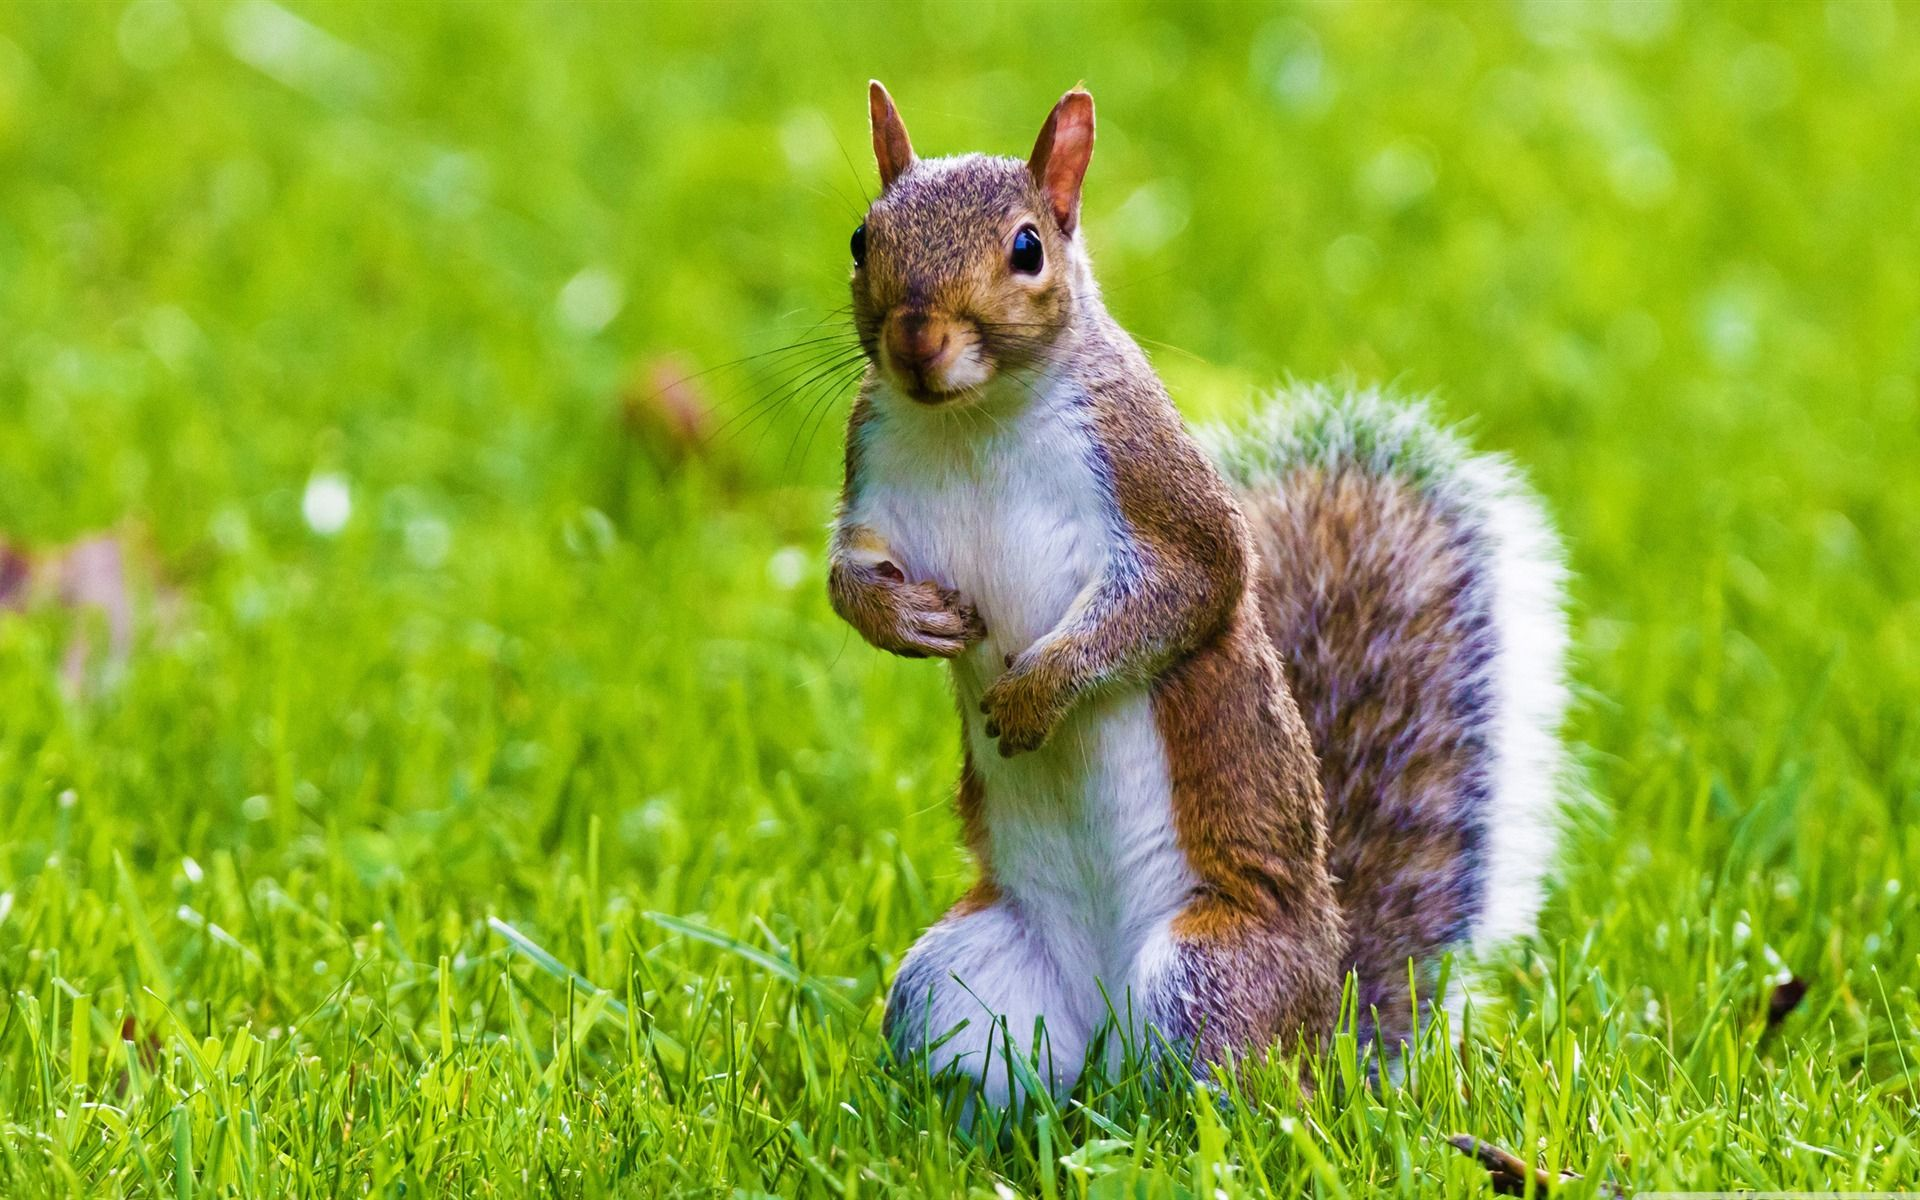 wild life Wallpaper, wildlife, cute, squirrel 561569